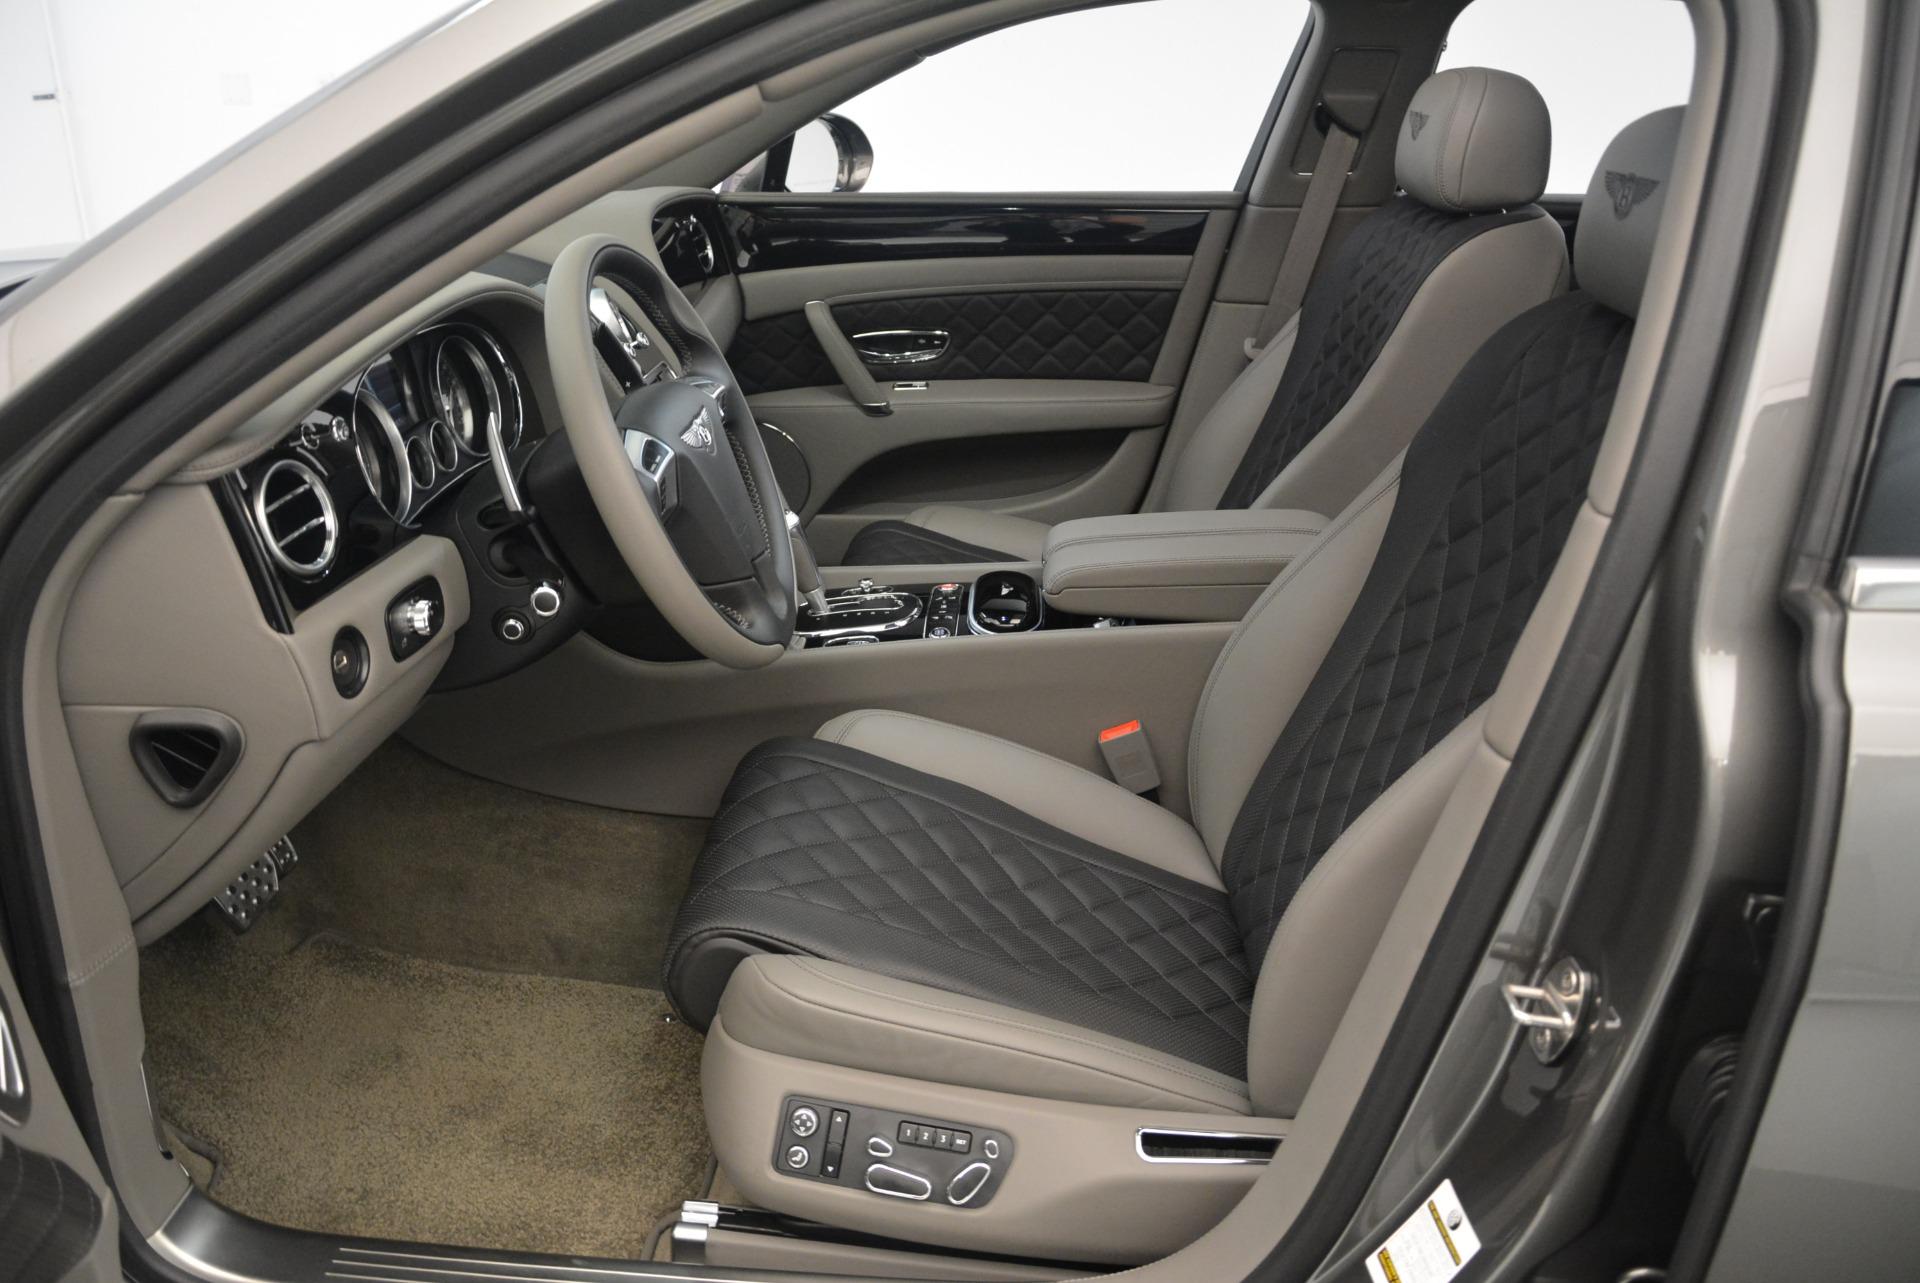 Used 2017 Bentley Flying Spur V8 S For Sale In Westport, CT 2263_p19